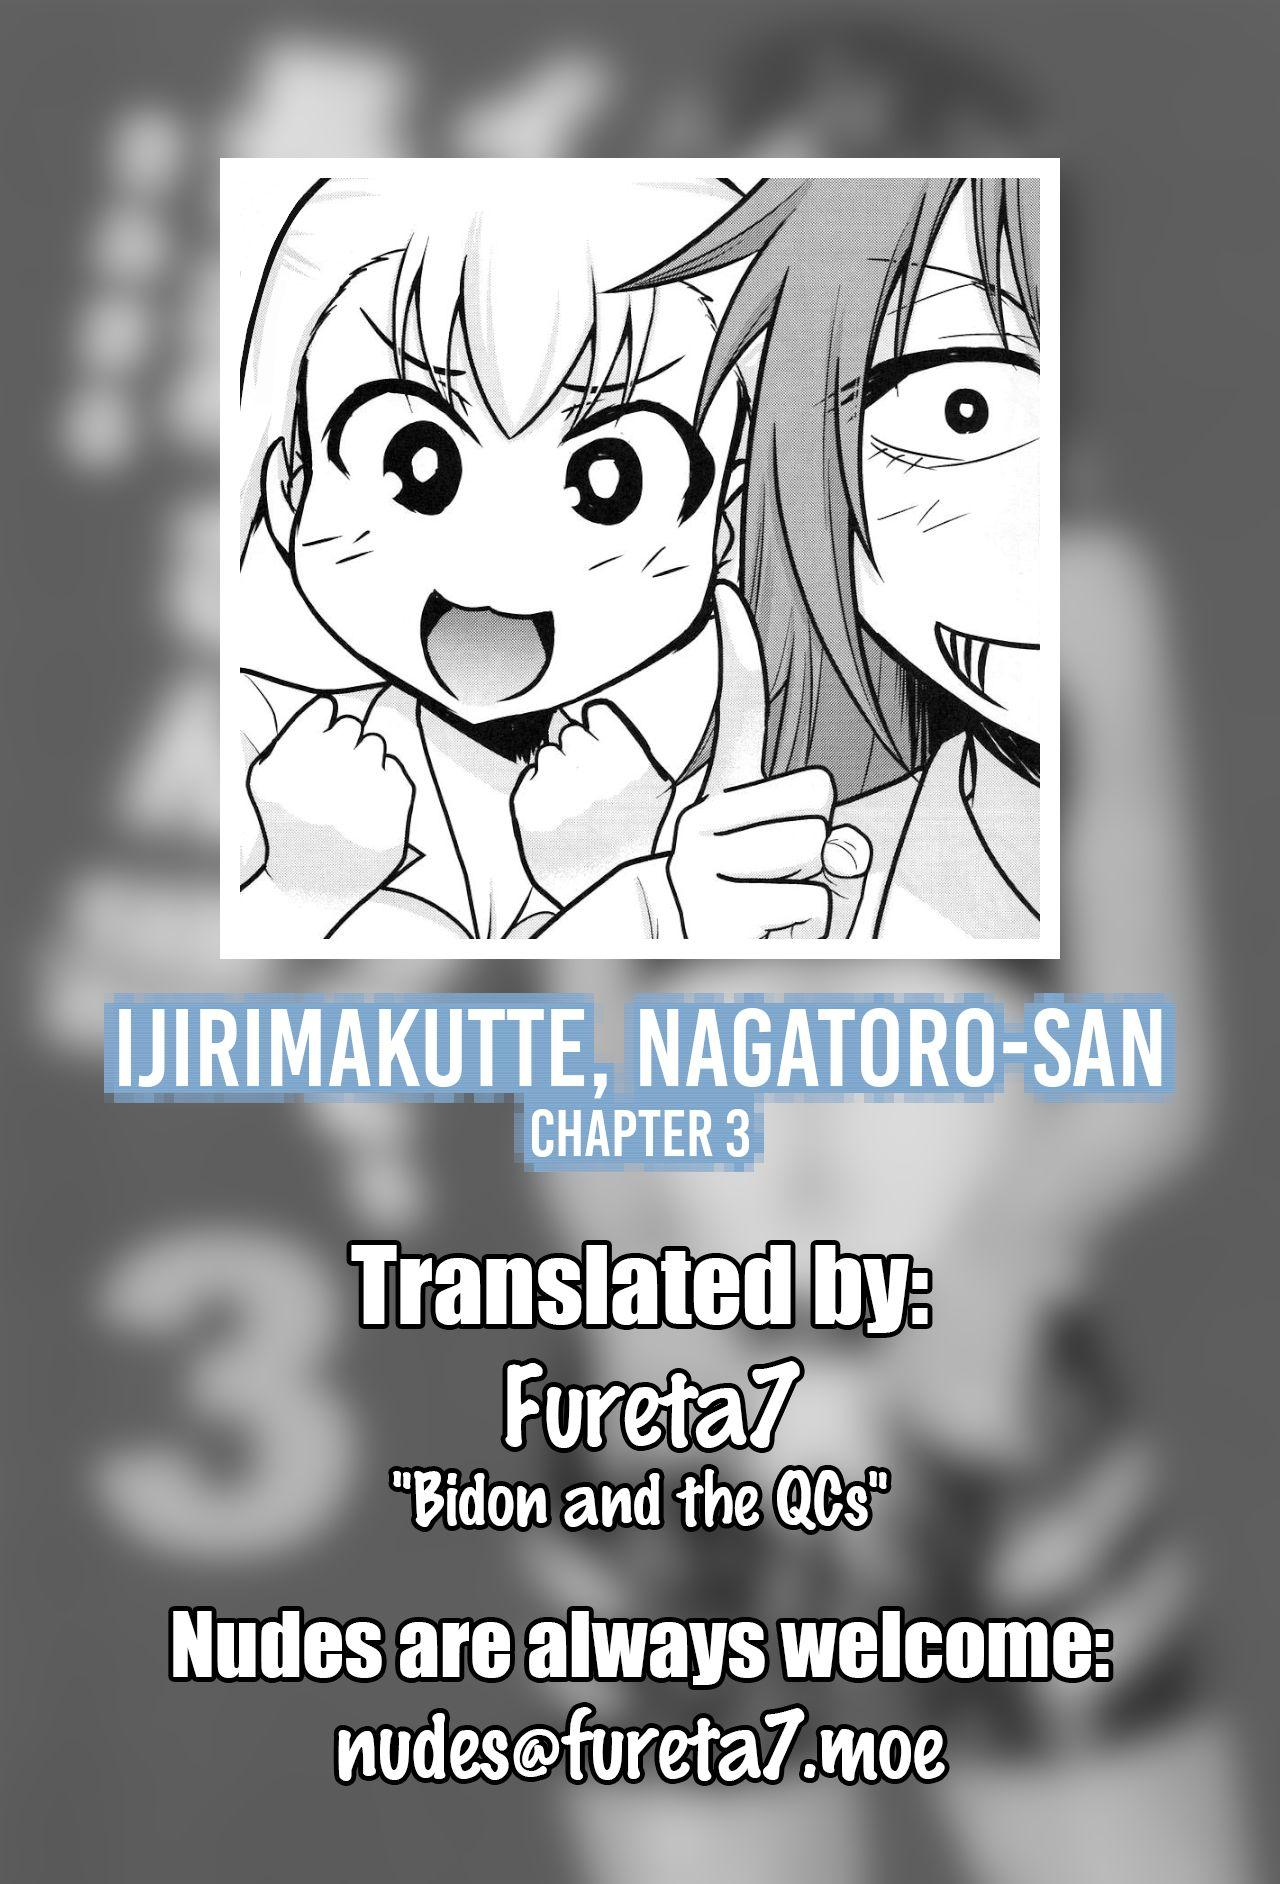 Ijirimakutte, Nagatoro-san 3 18